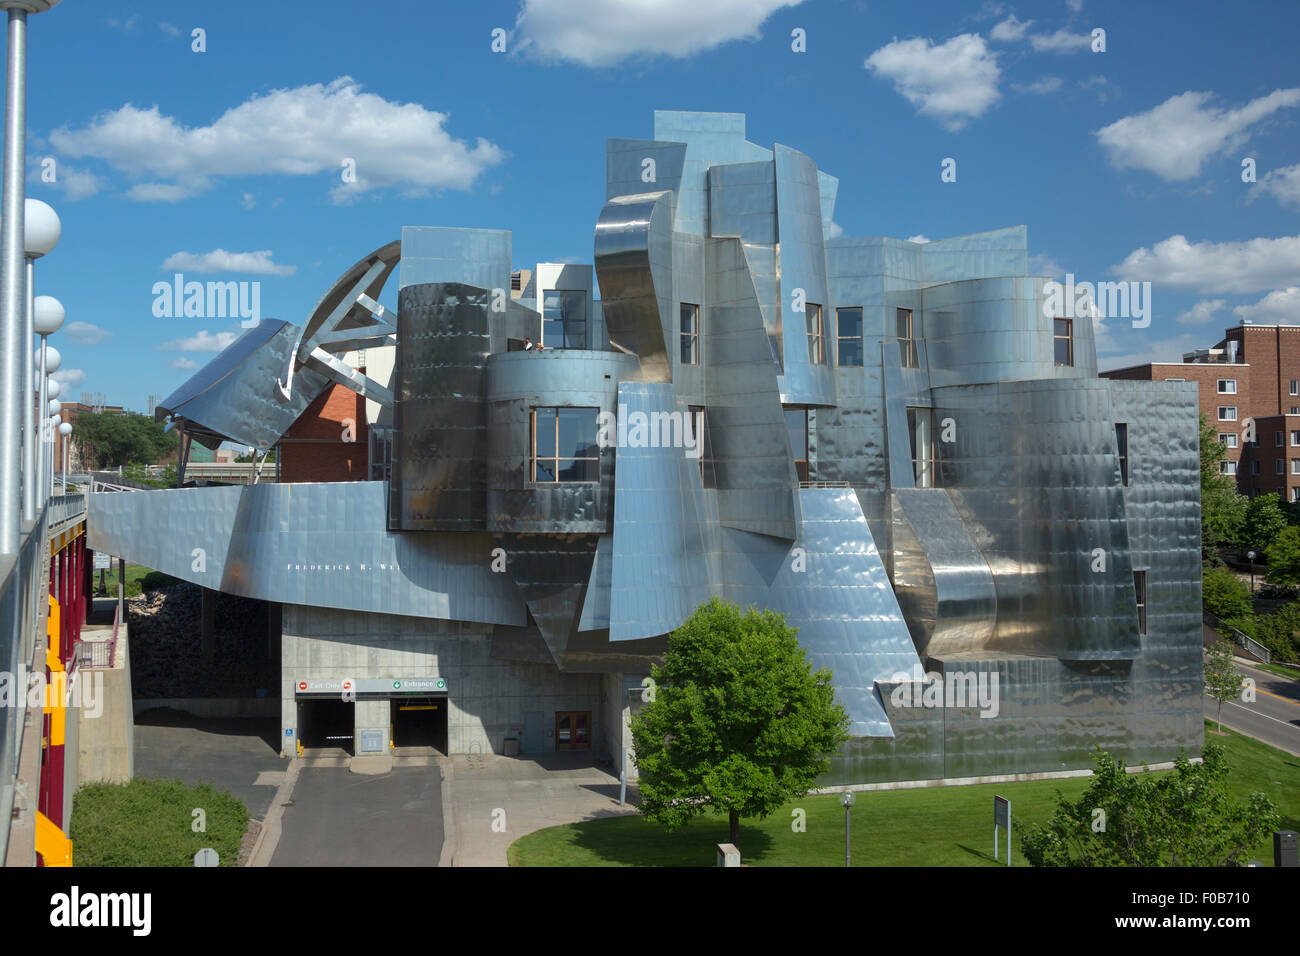 WEISMAN ART MUSEUM (©FRANK GEHRY 1993) MINNESOTA UNIVERSITY CAMPUS MINNEAPOLIS MINNESOTA USA - Stock Image